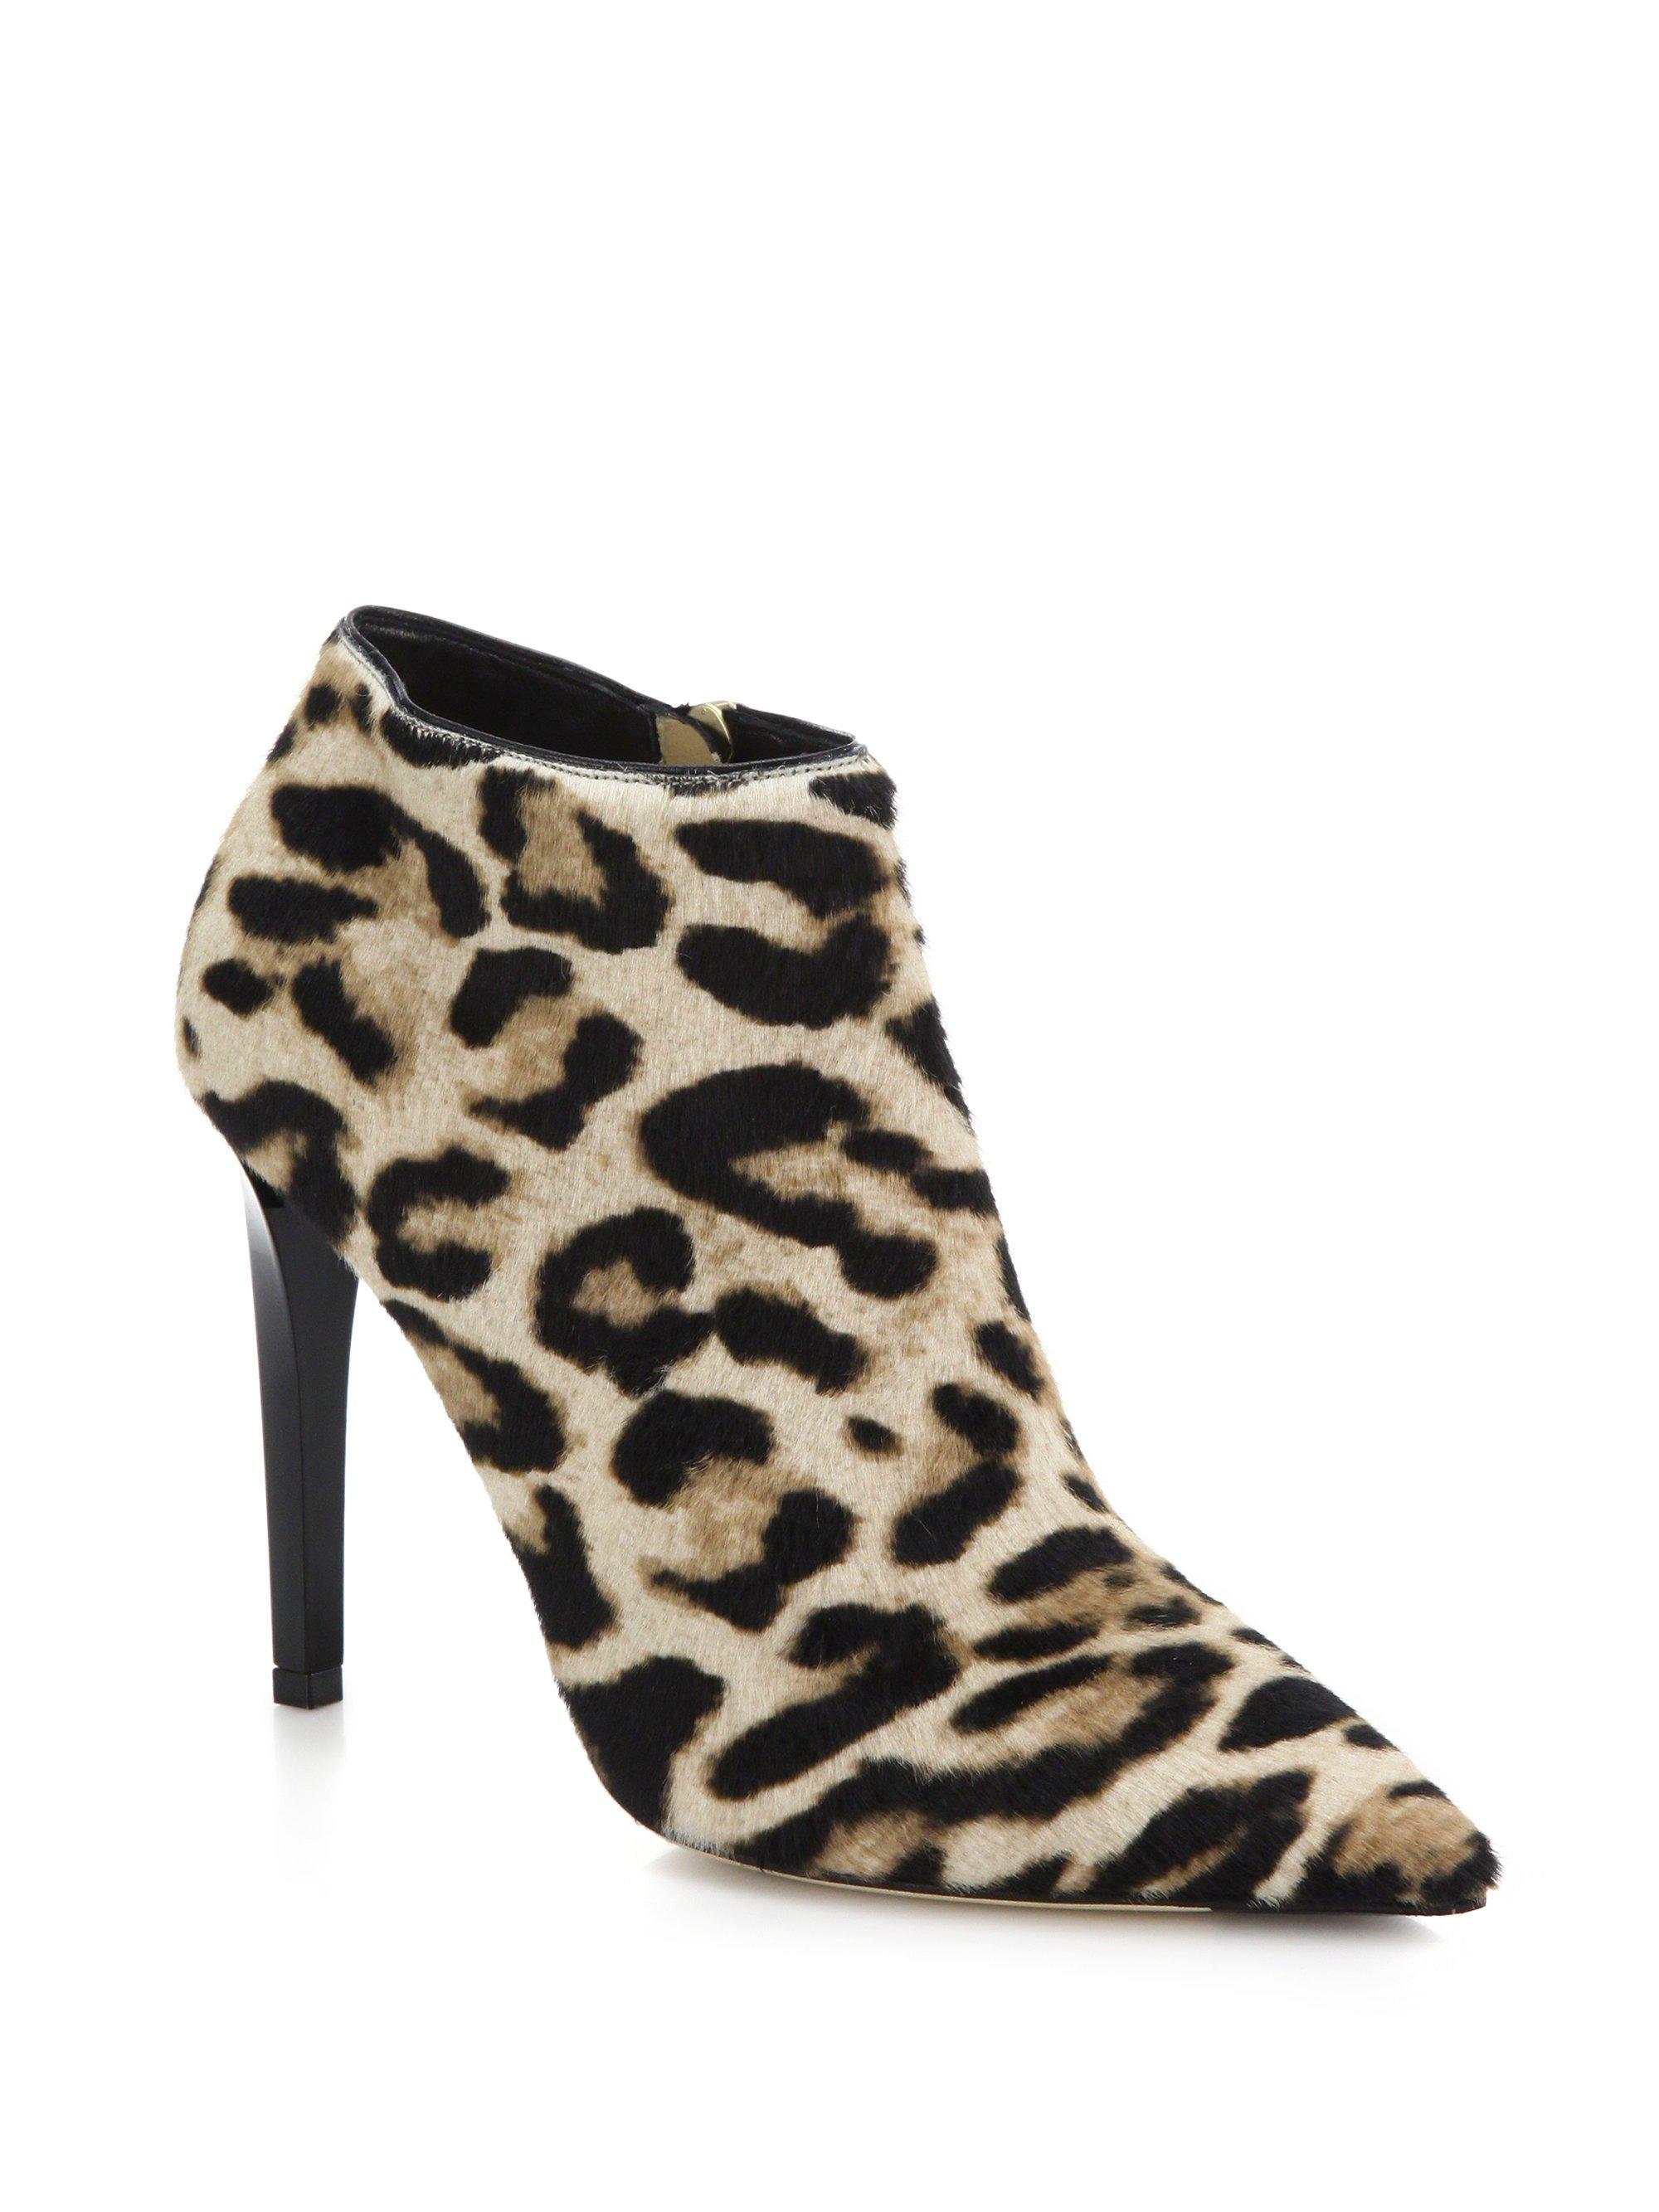 ee6861a86a6 ... sale lyst jimmy choo liesl leopard print calf hair booties in natural  76909 58b19